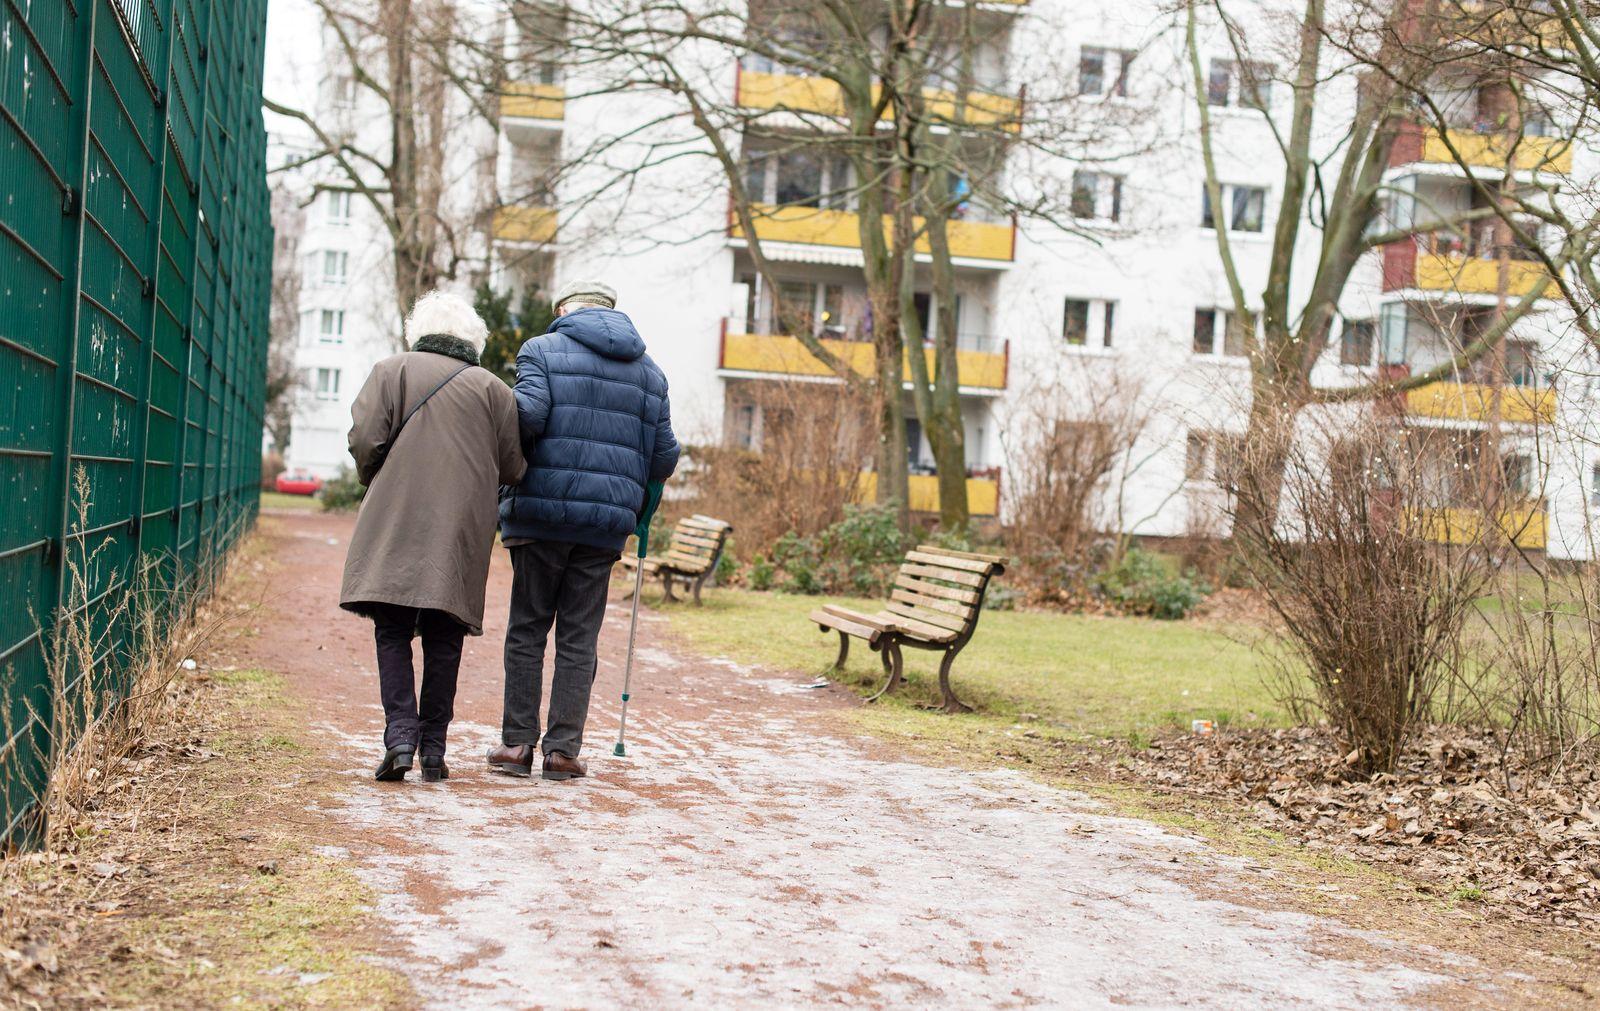 Rente / Rentner / Senioren / Altersarmut / älteres Ehepaar